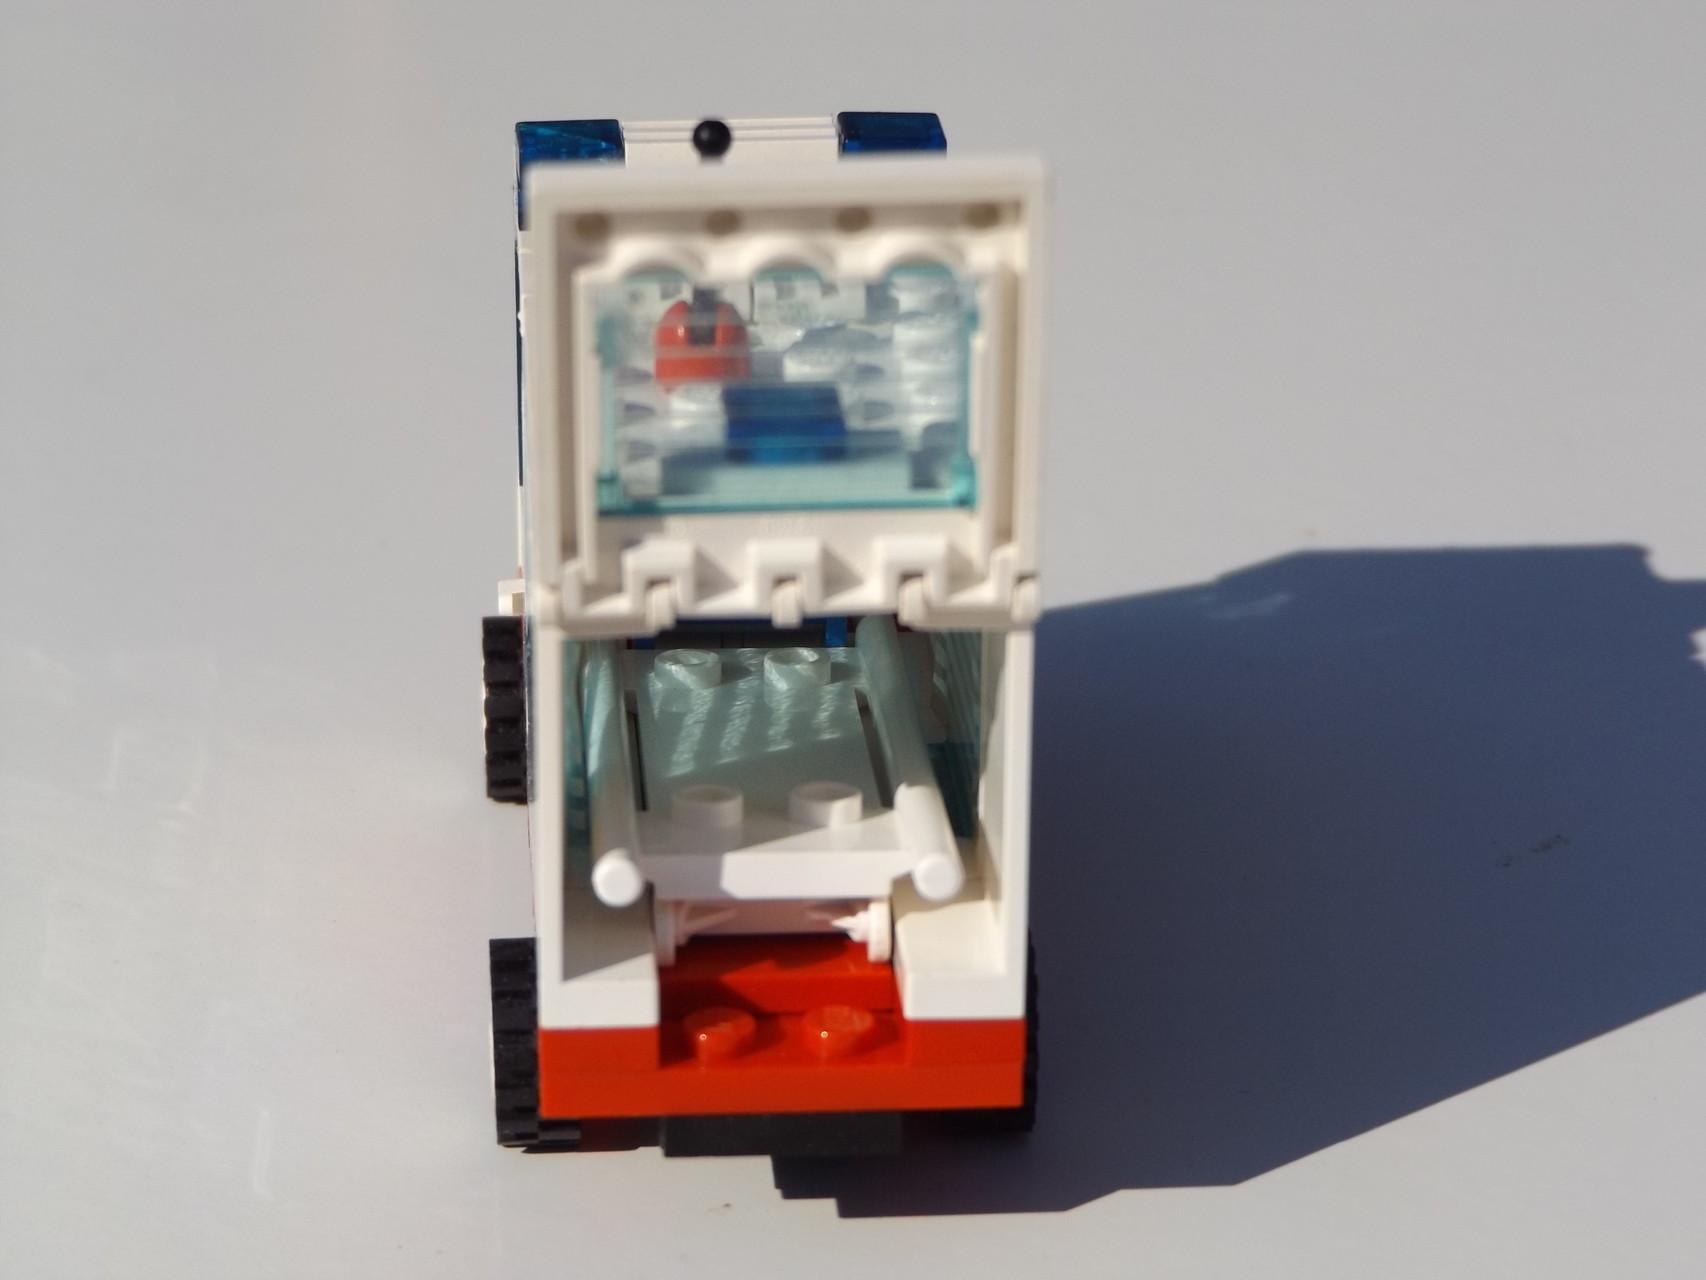 Krankenwagen Innenraum